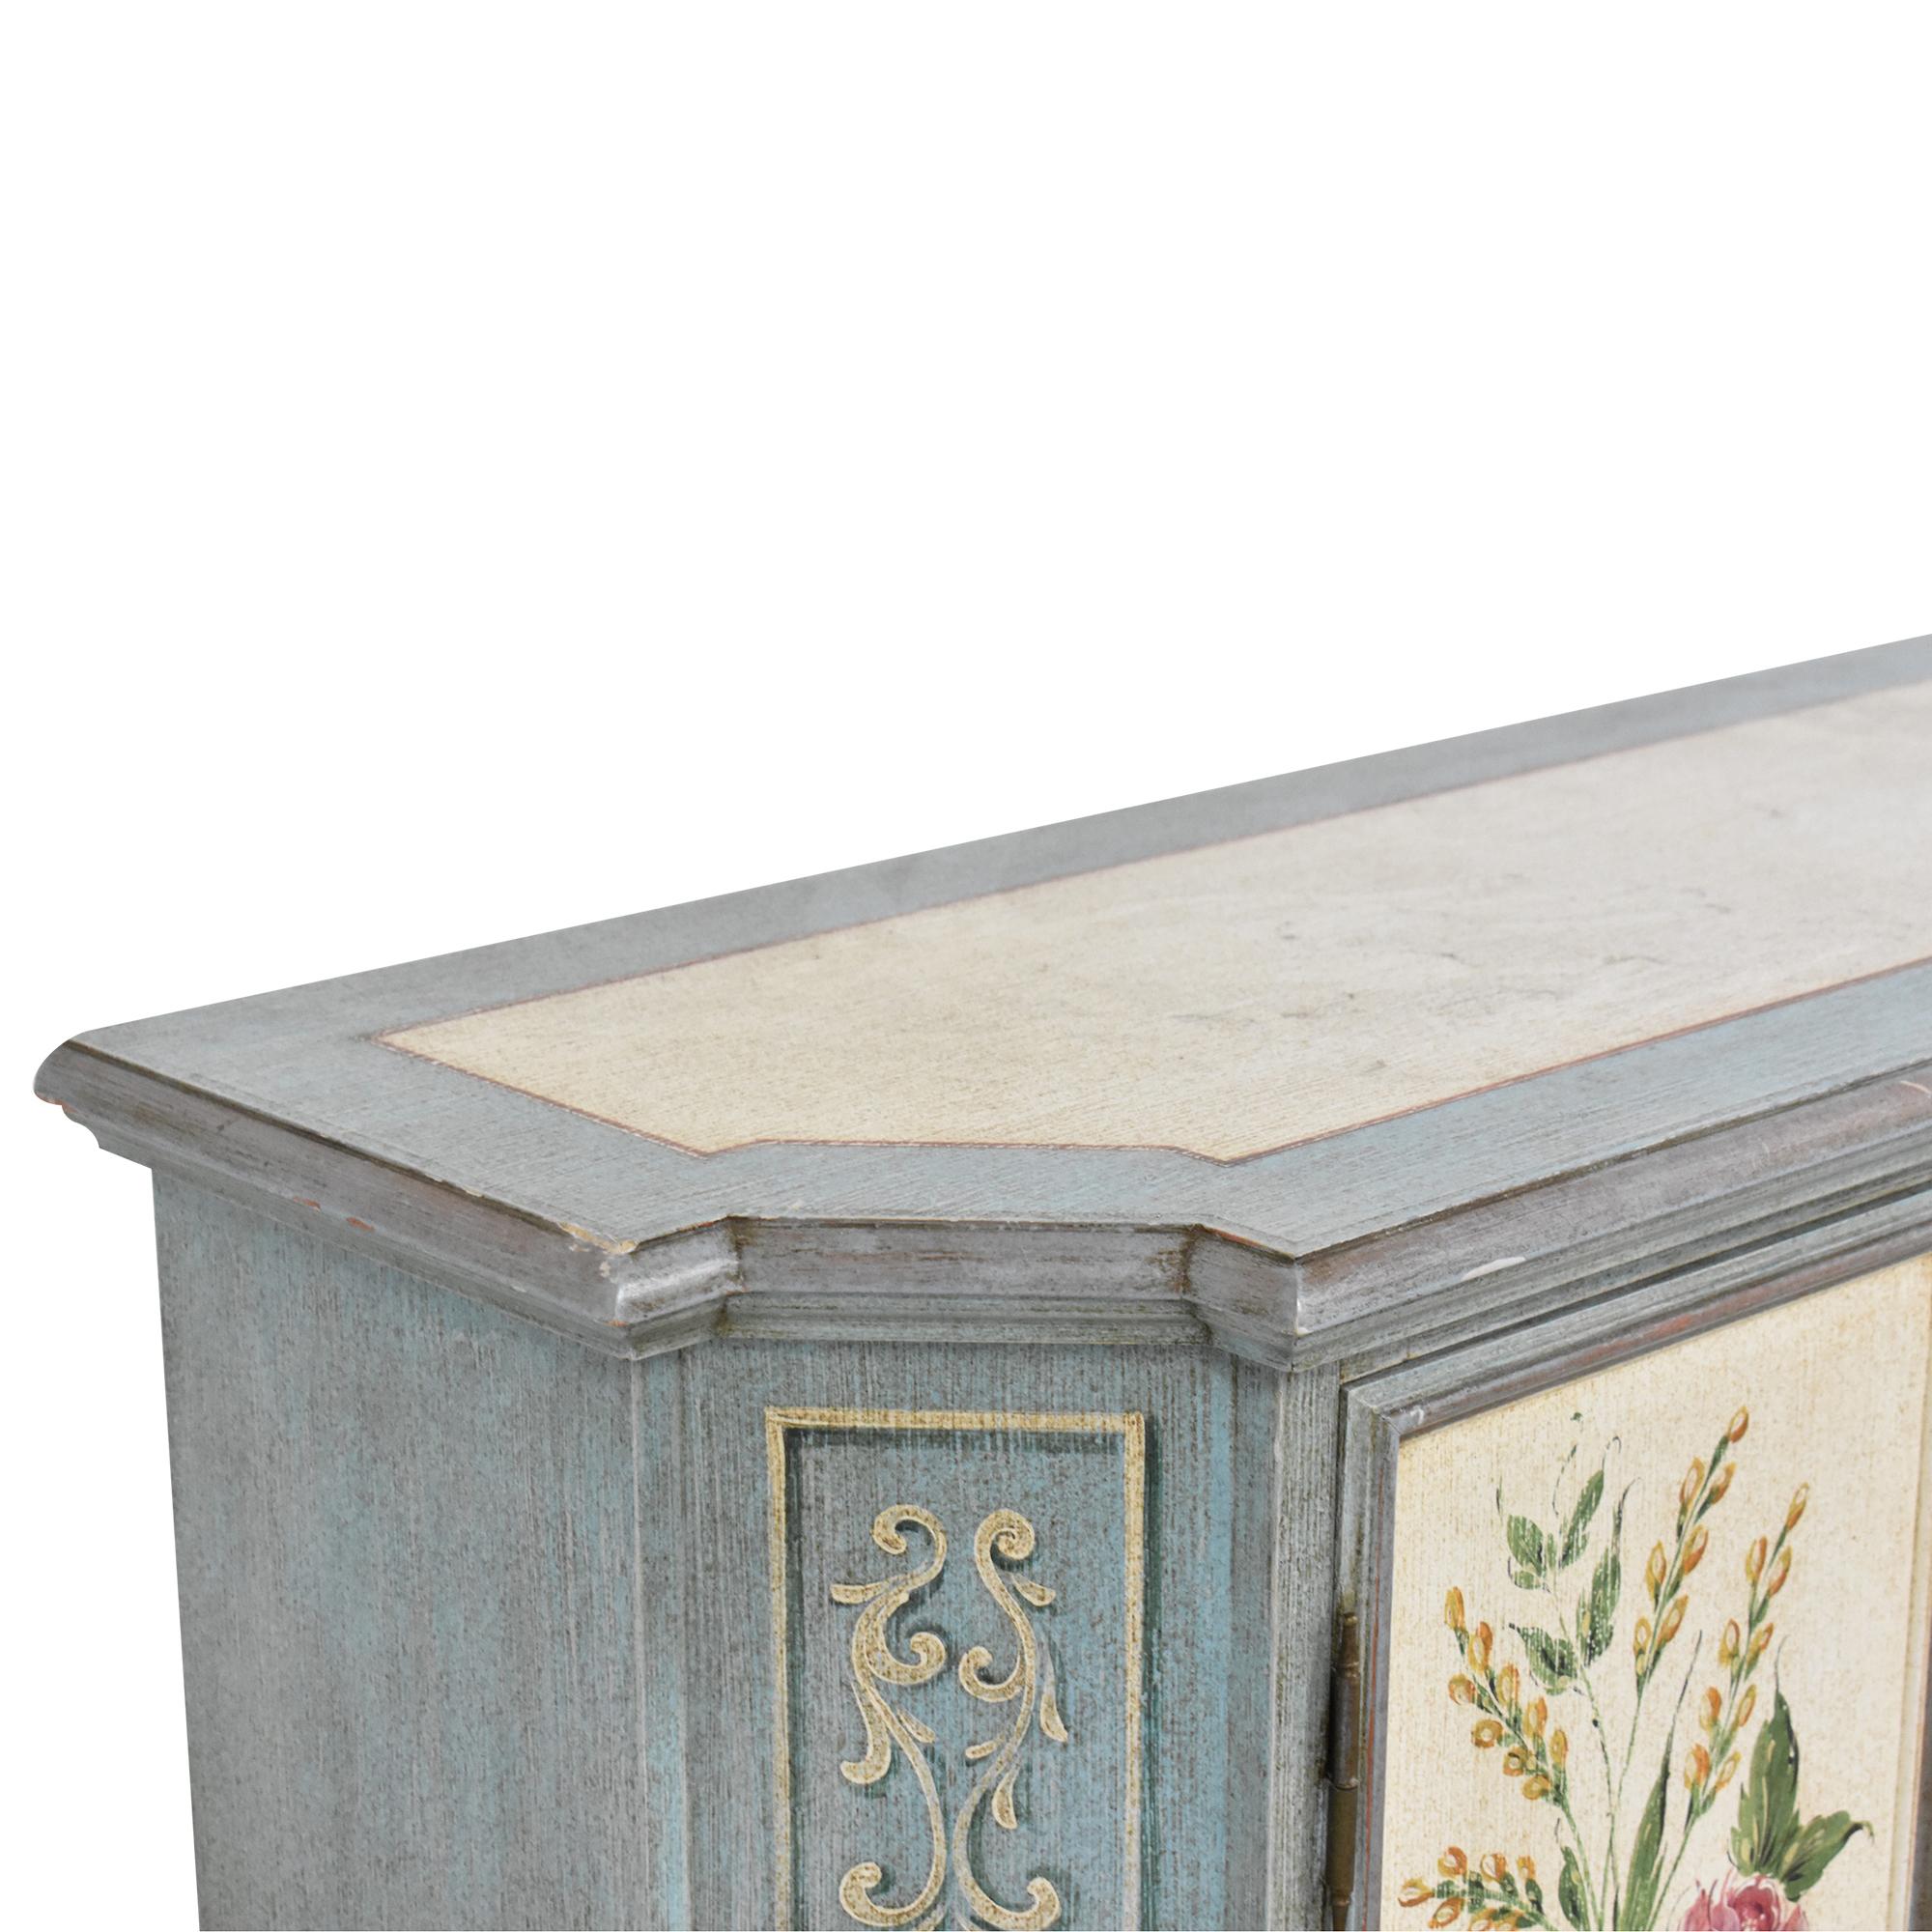 Vintage Painted Cabinet dimensions